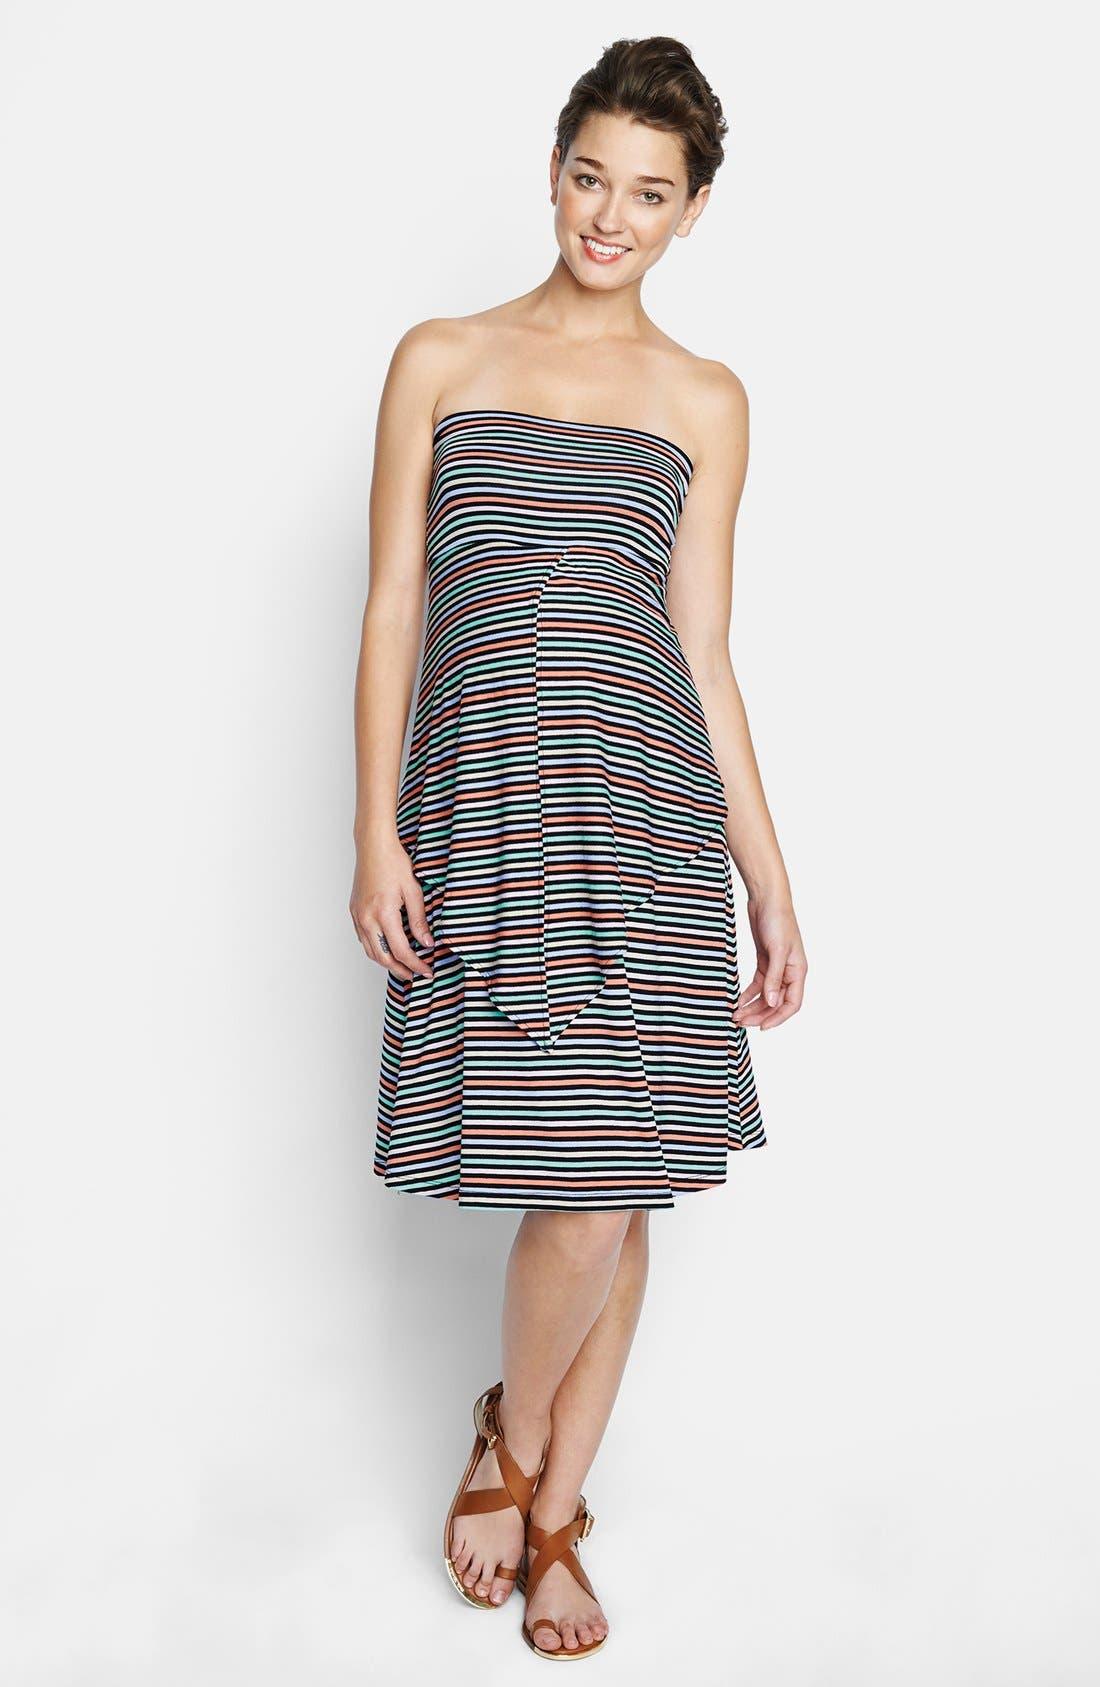 Convertible Maternity Dress,                             Main thumbnail 1, color,                             Candy Stripes